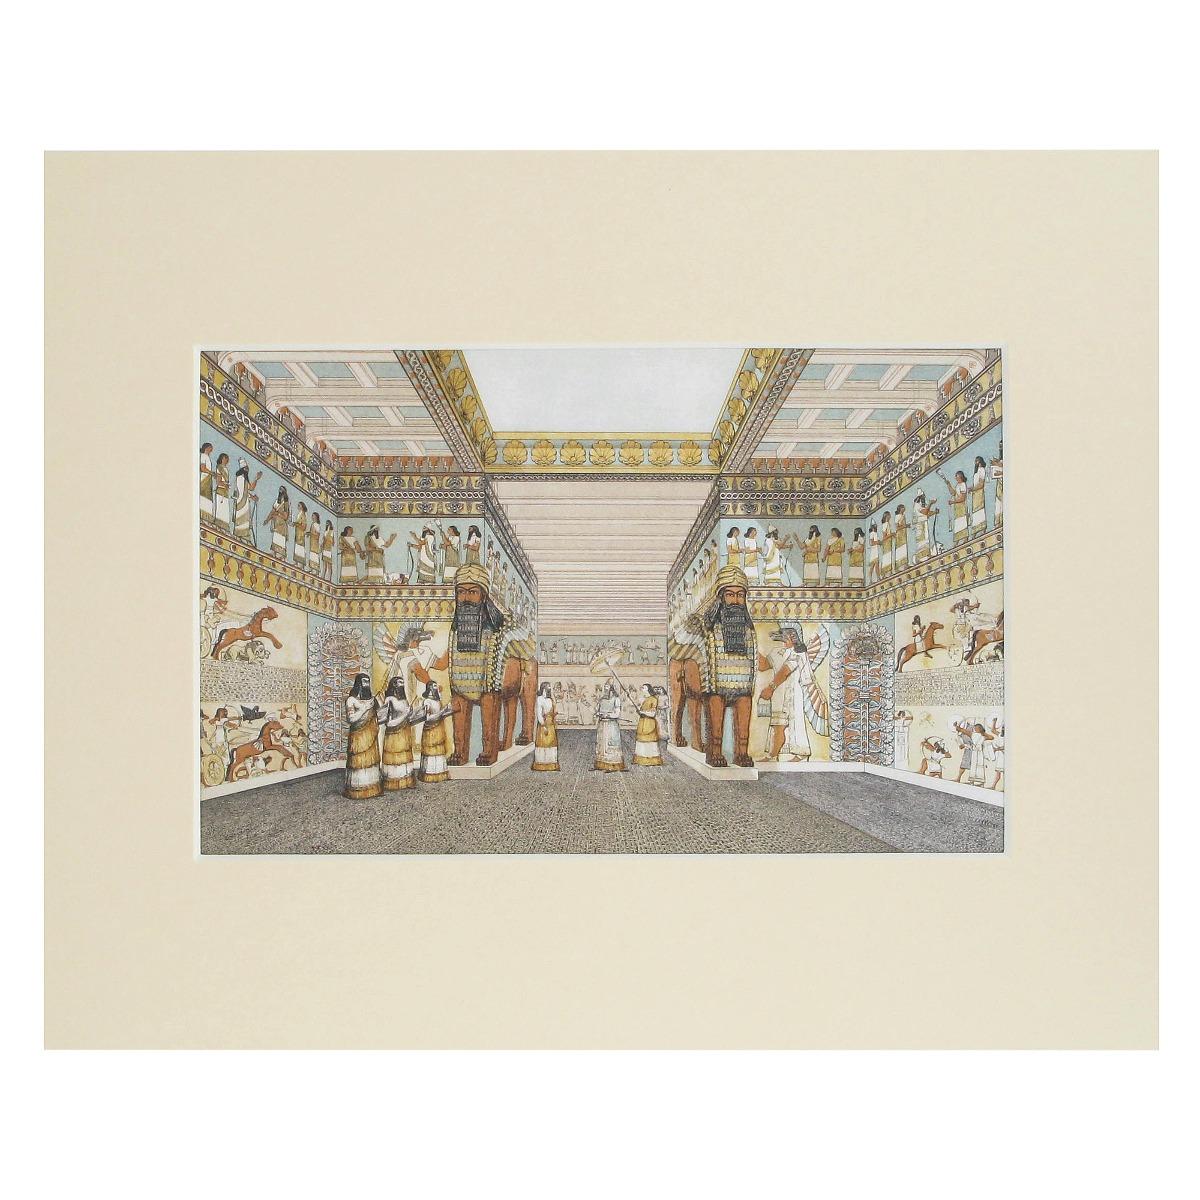 Assyrian palace mounted prints